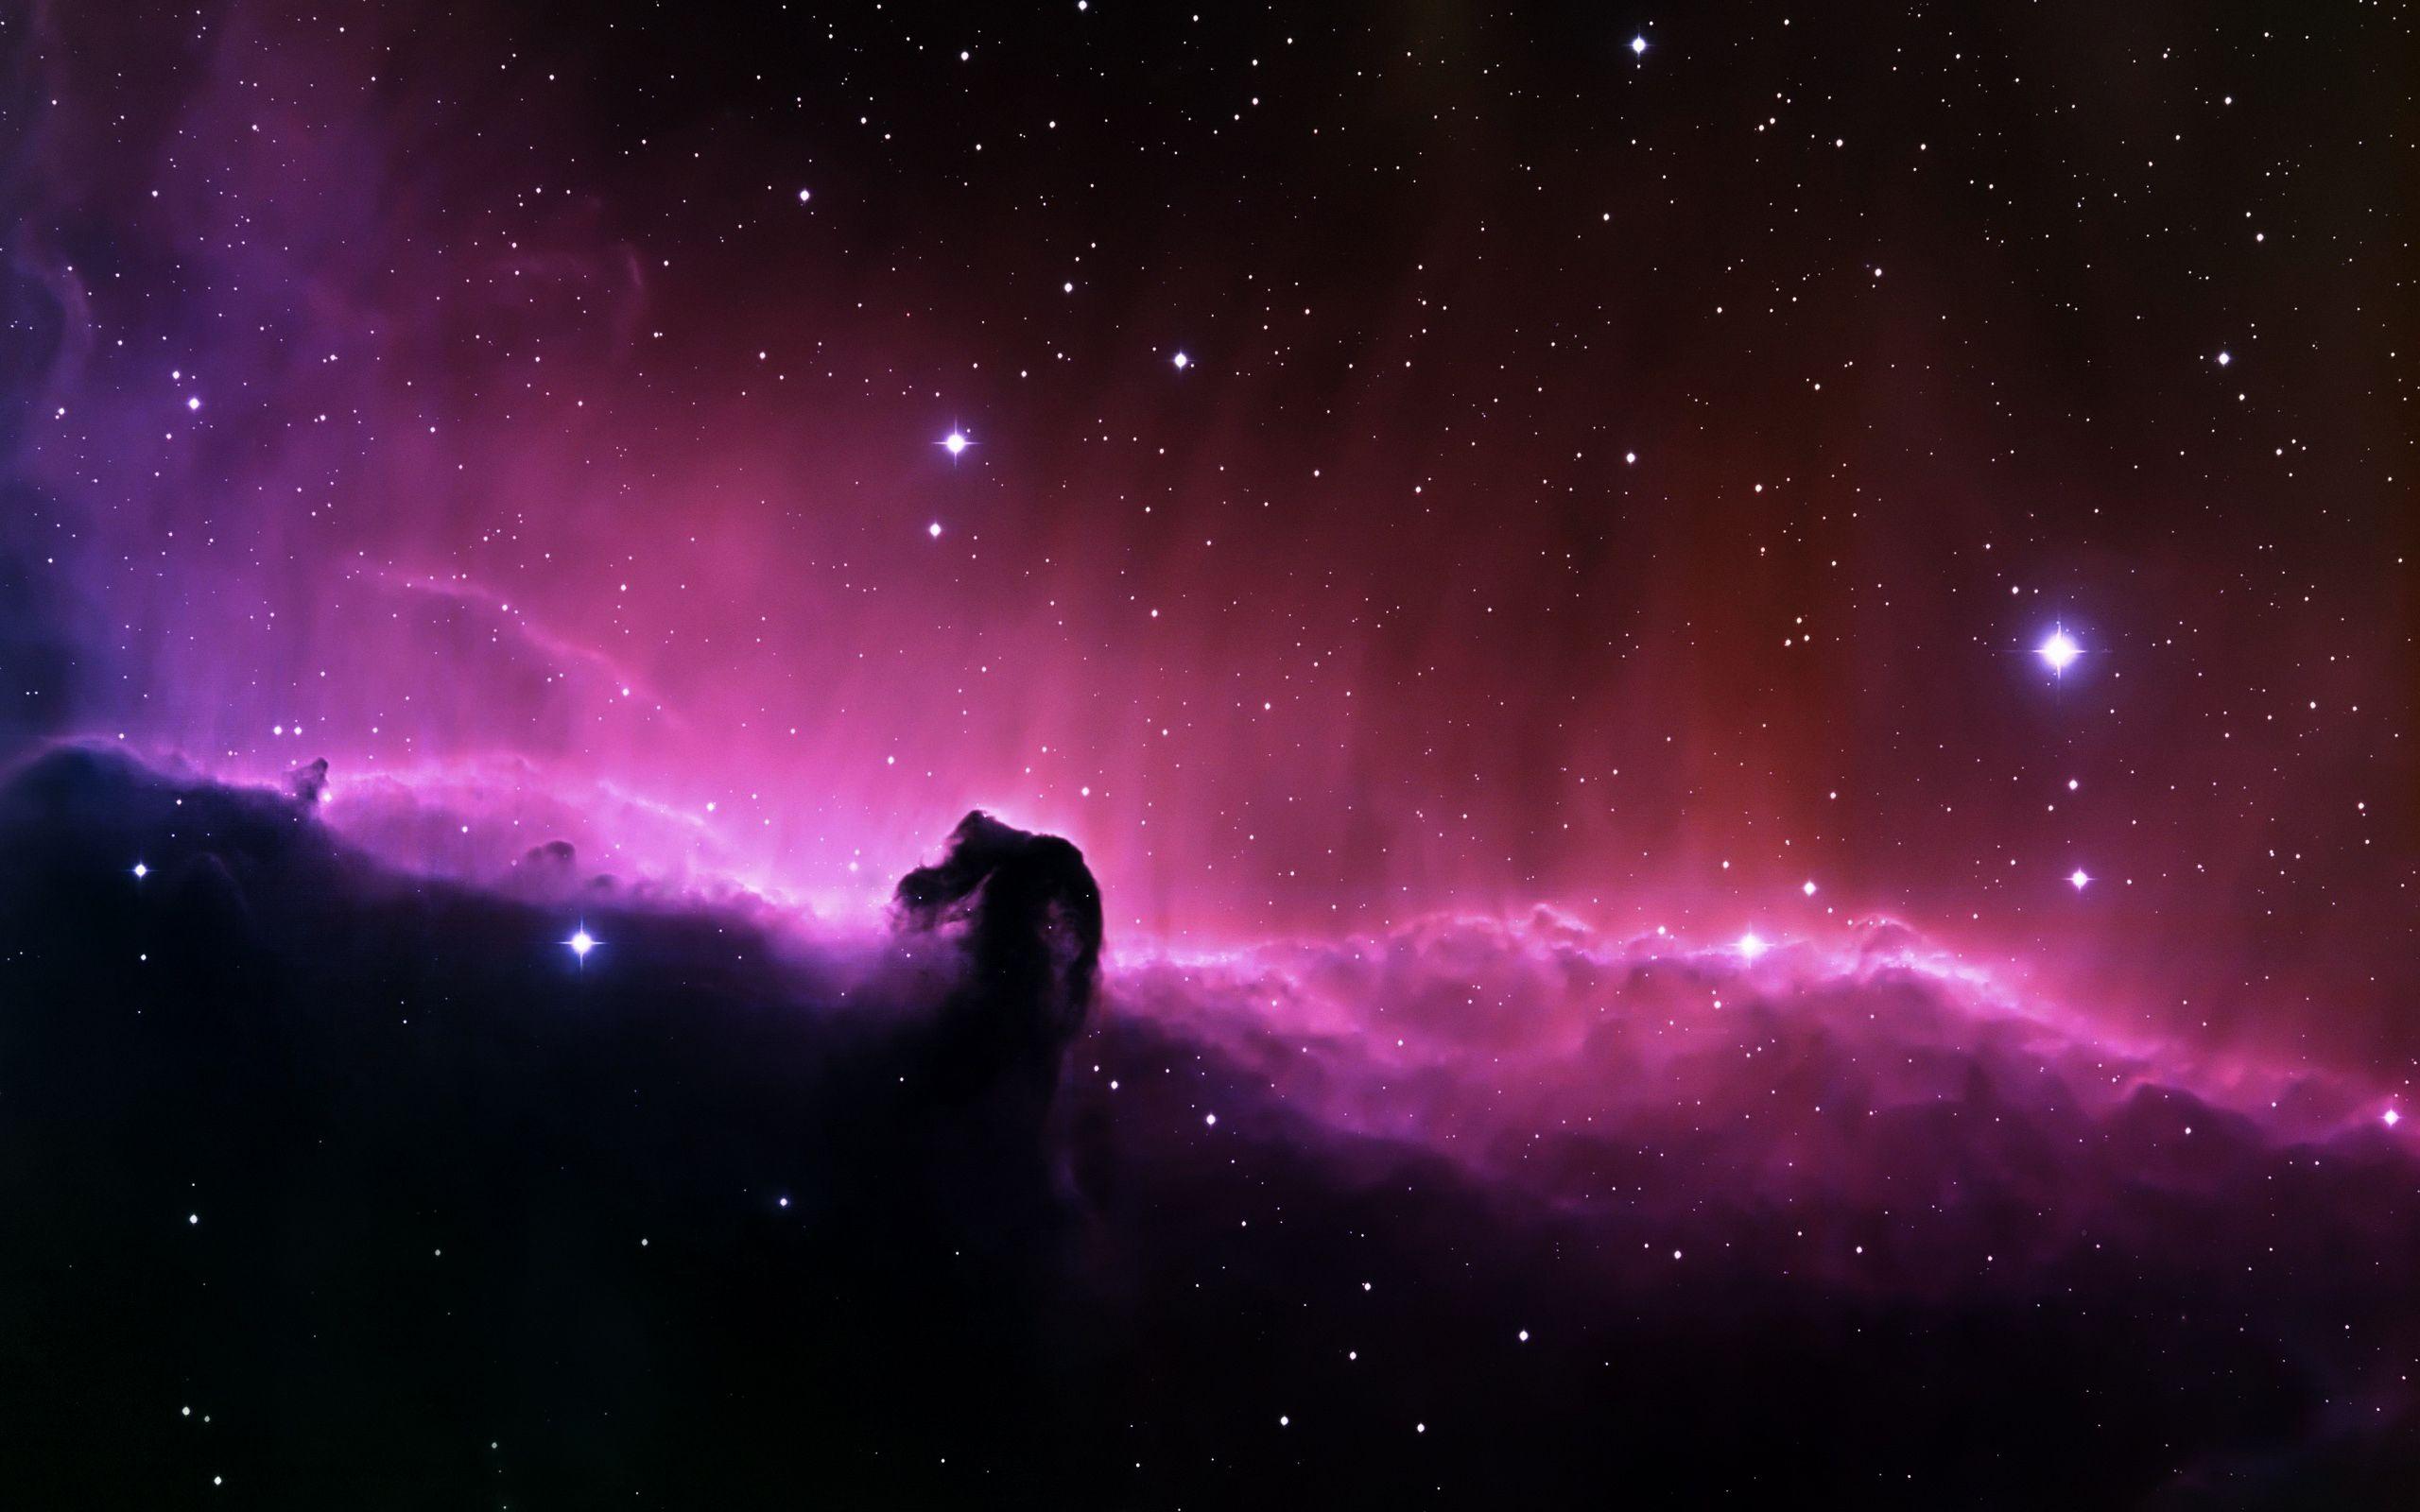 Top Wallpaper Horse Nebula - 57a49ce3fc0c8978c4ac4ccbd0f84912  Pic_648497.jpg